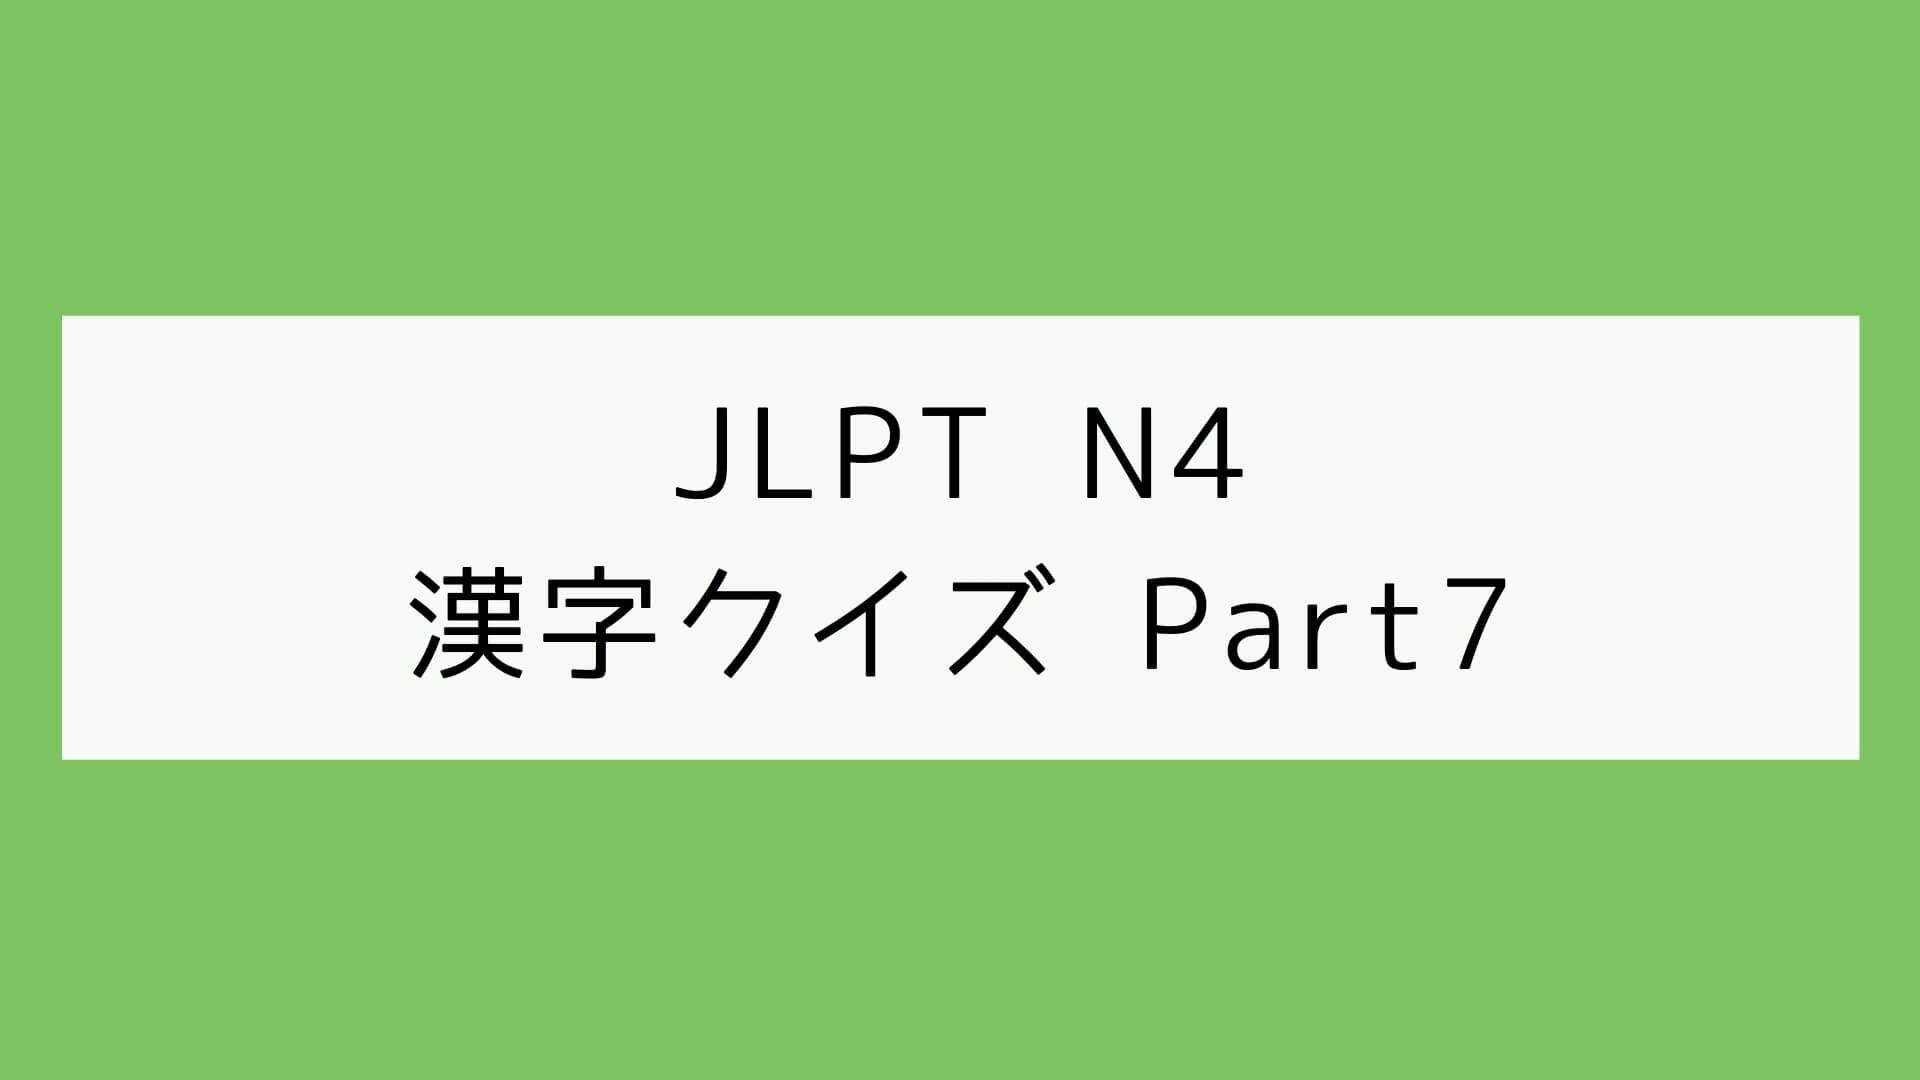 【JLPT N4】漢字クイズ Part7